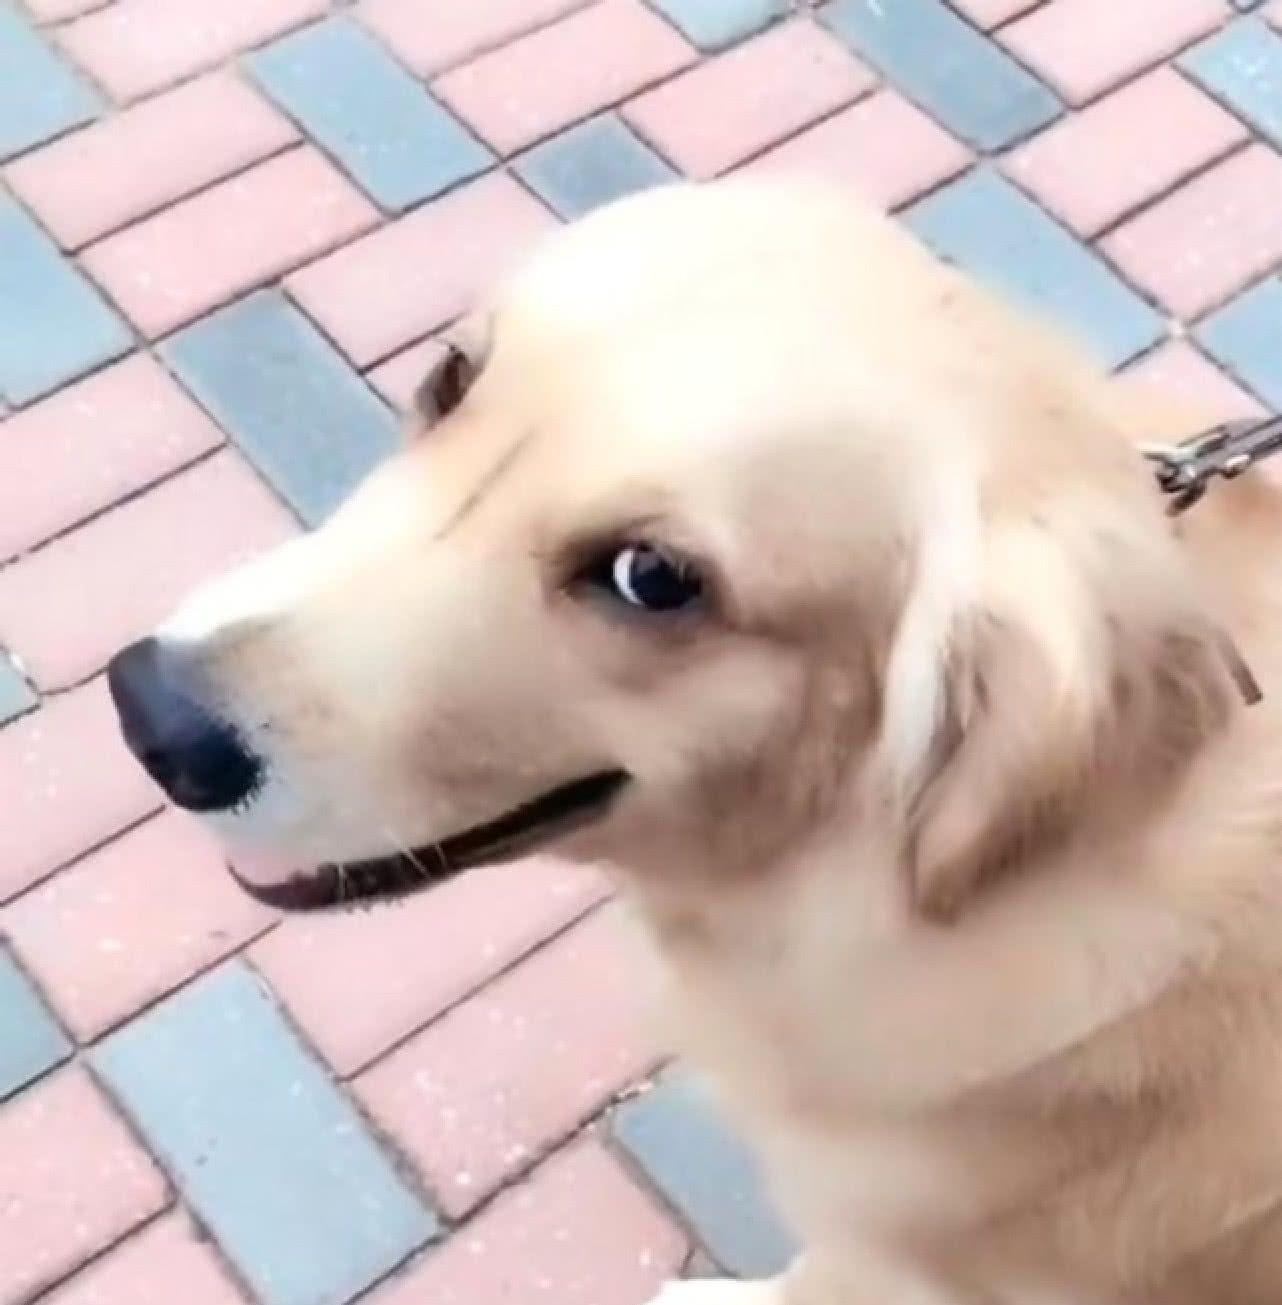 <b>狗子拉出红色的便便,主人被吓了一坏,等走近一看却一脸尴尬!</b>